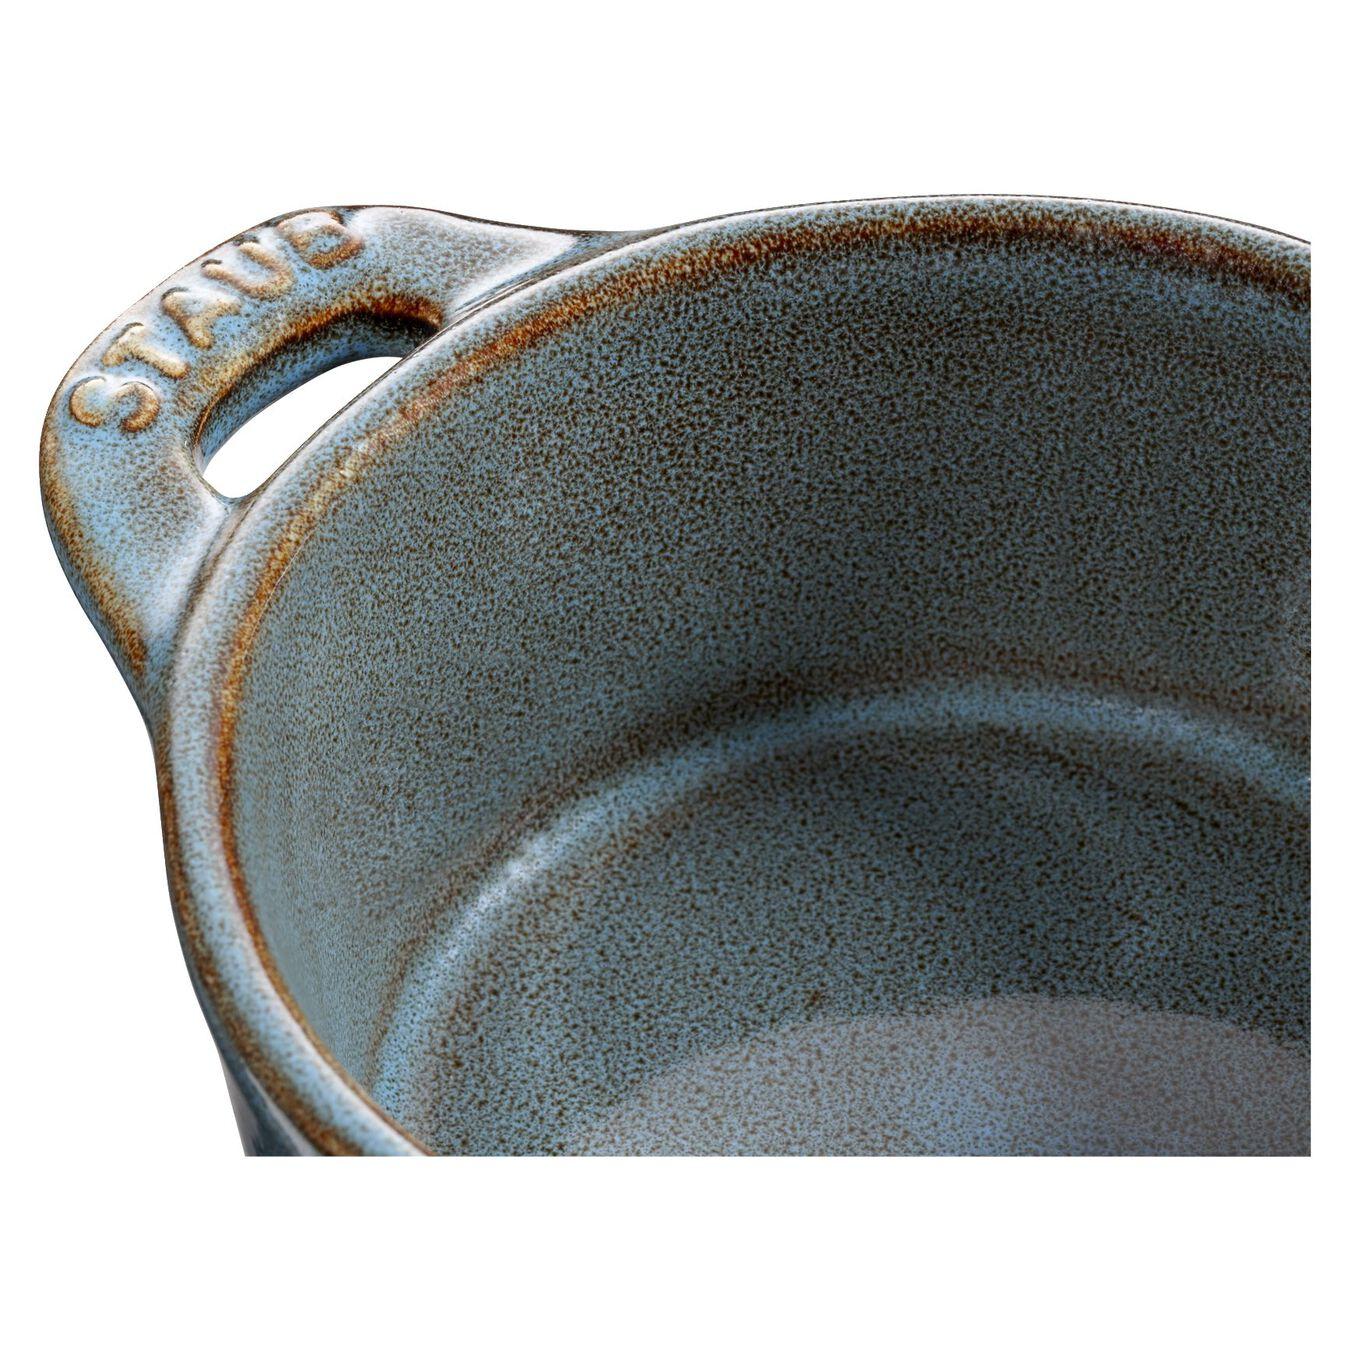 Mini Cocotte 10 cm, rund, Antik-Türkis, Keramik,,large 5